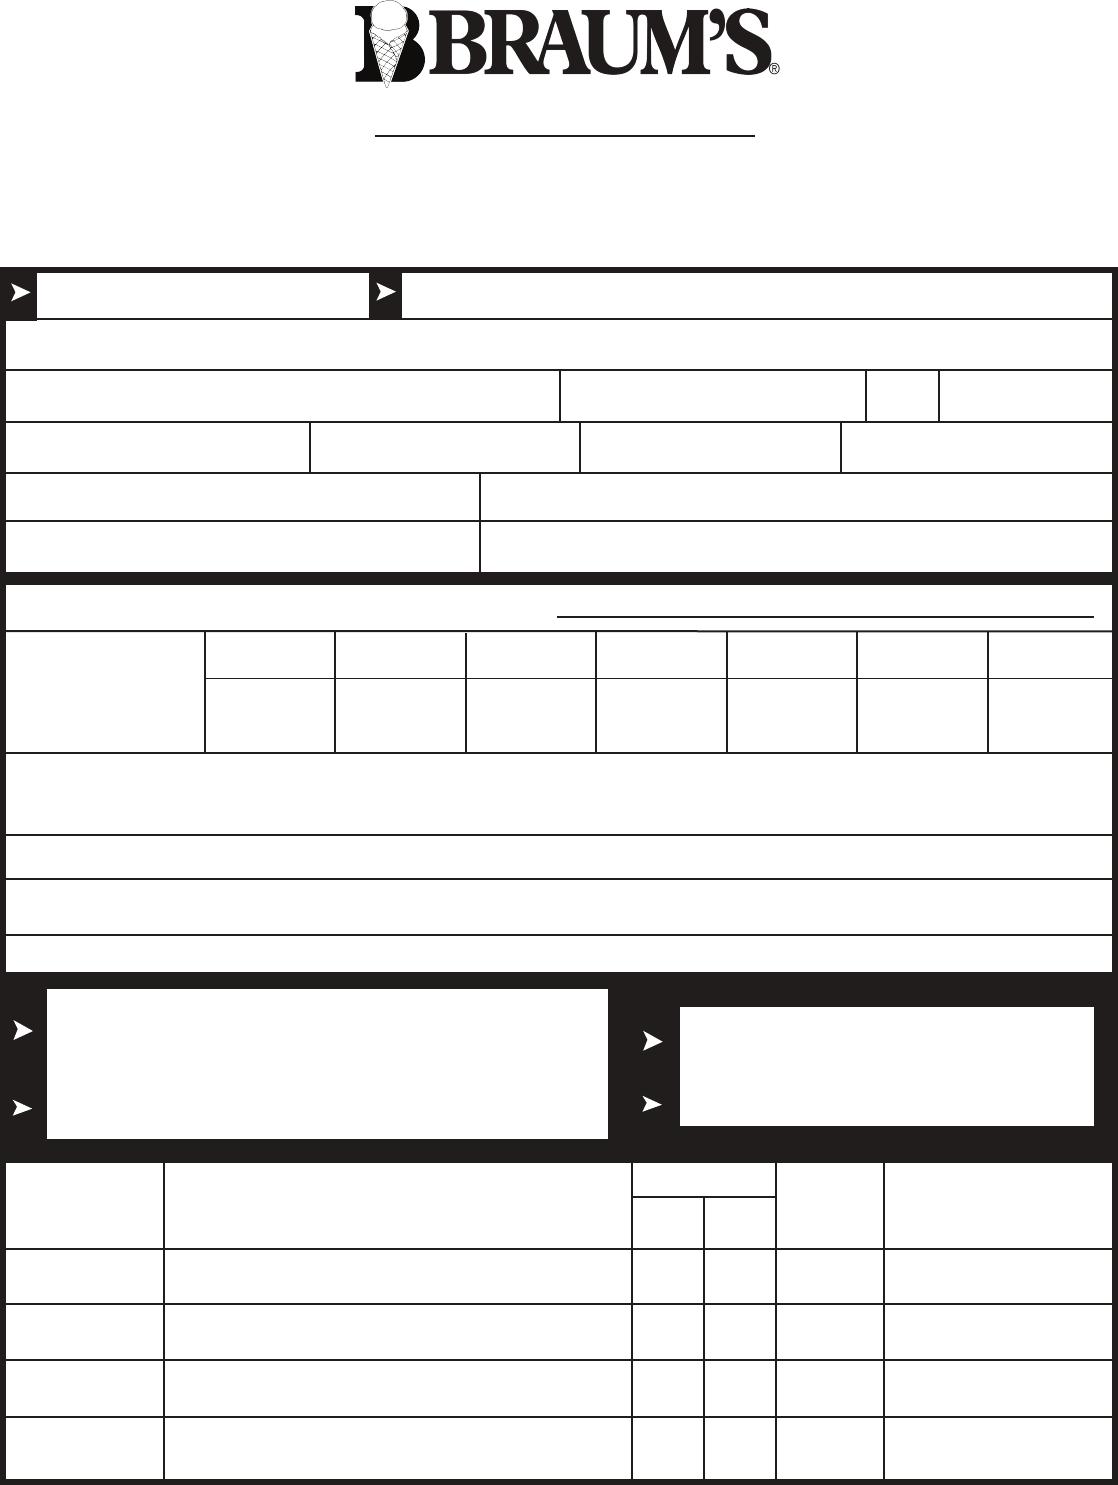 Free printable braums job application form falaconquin